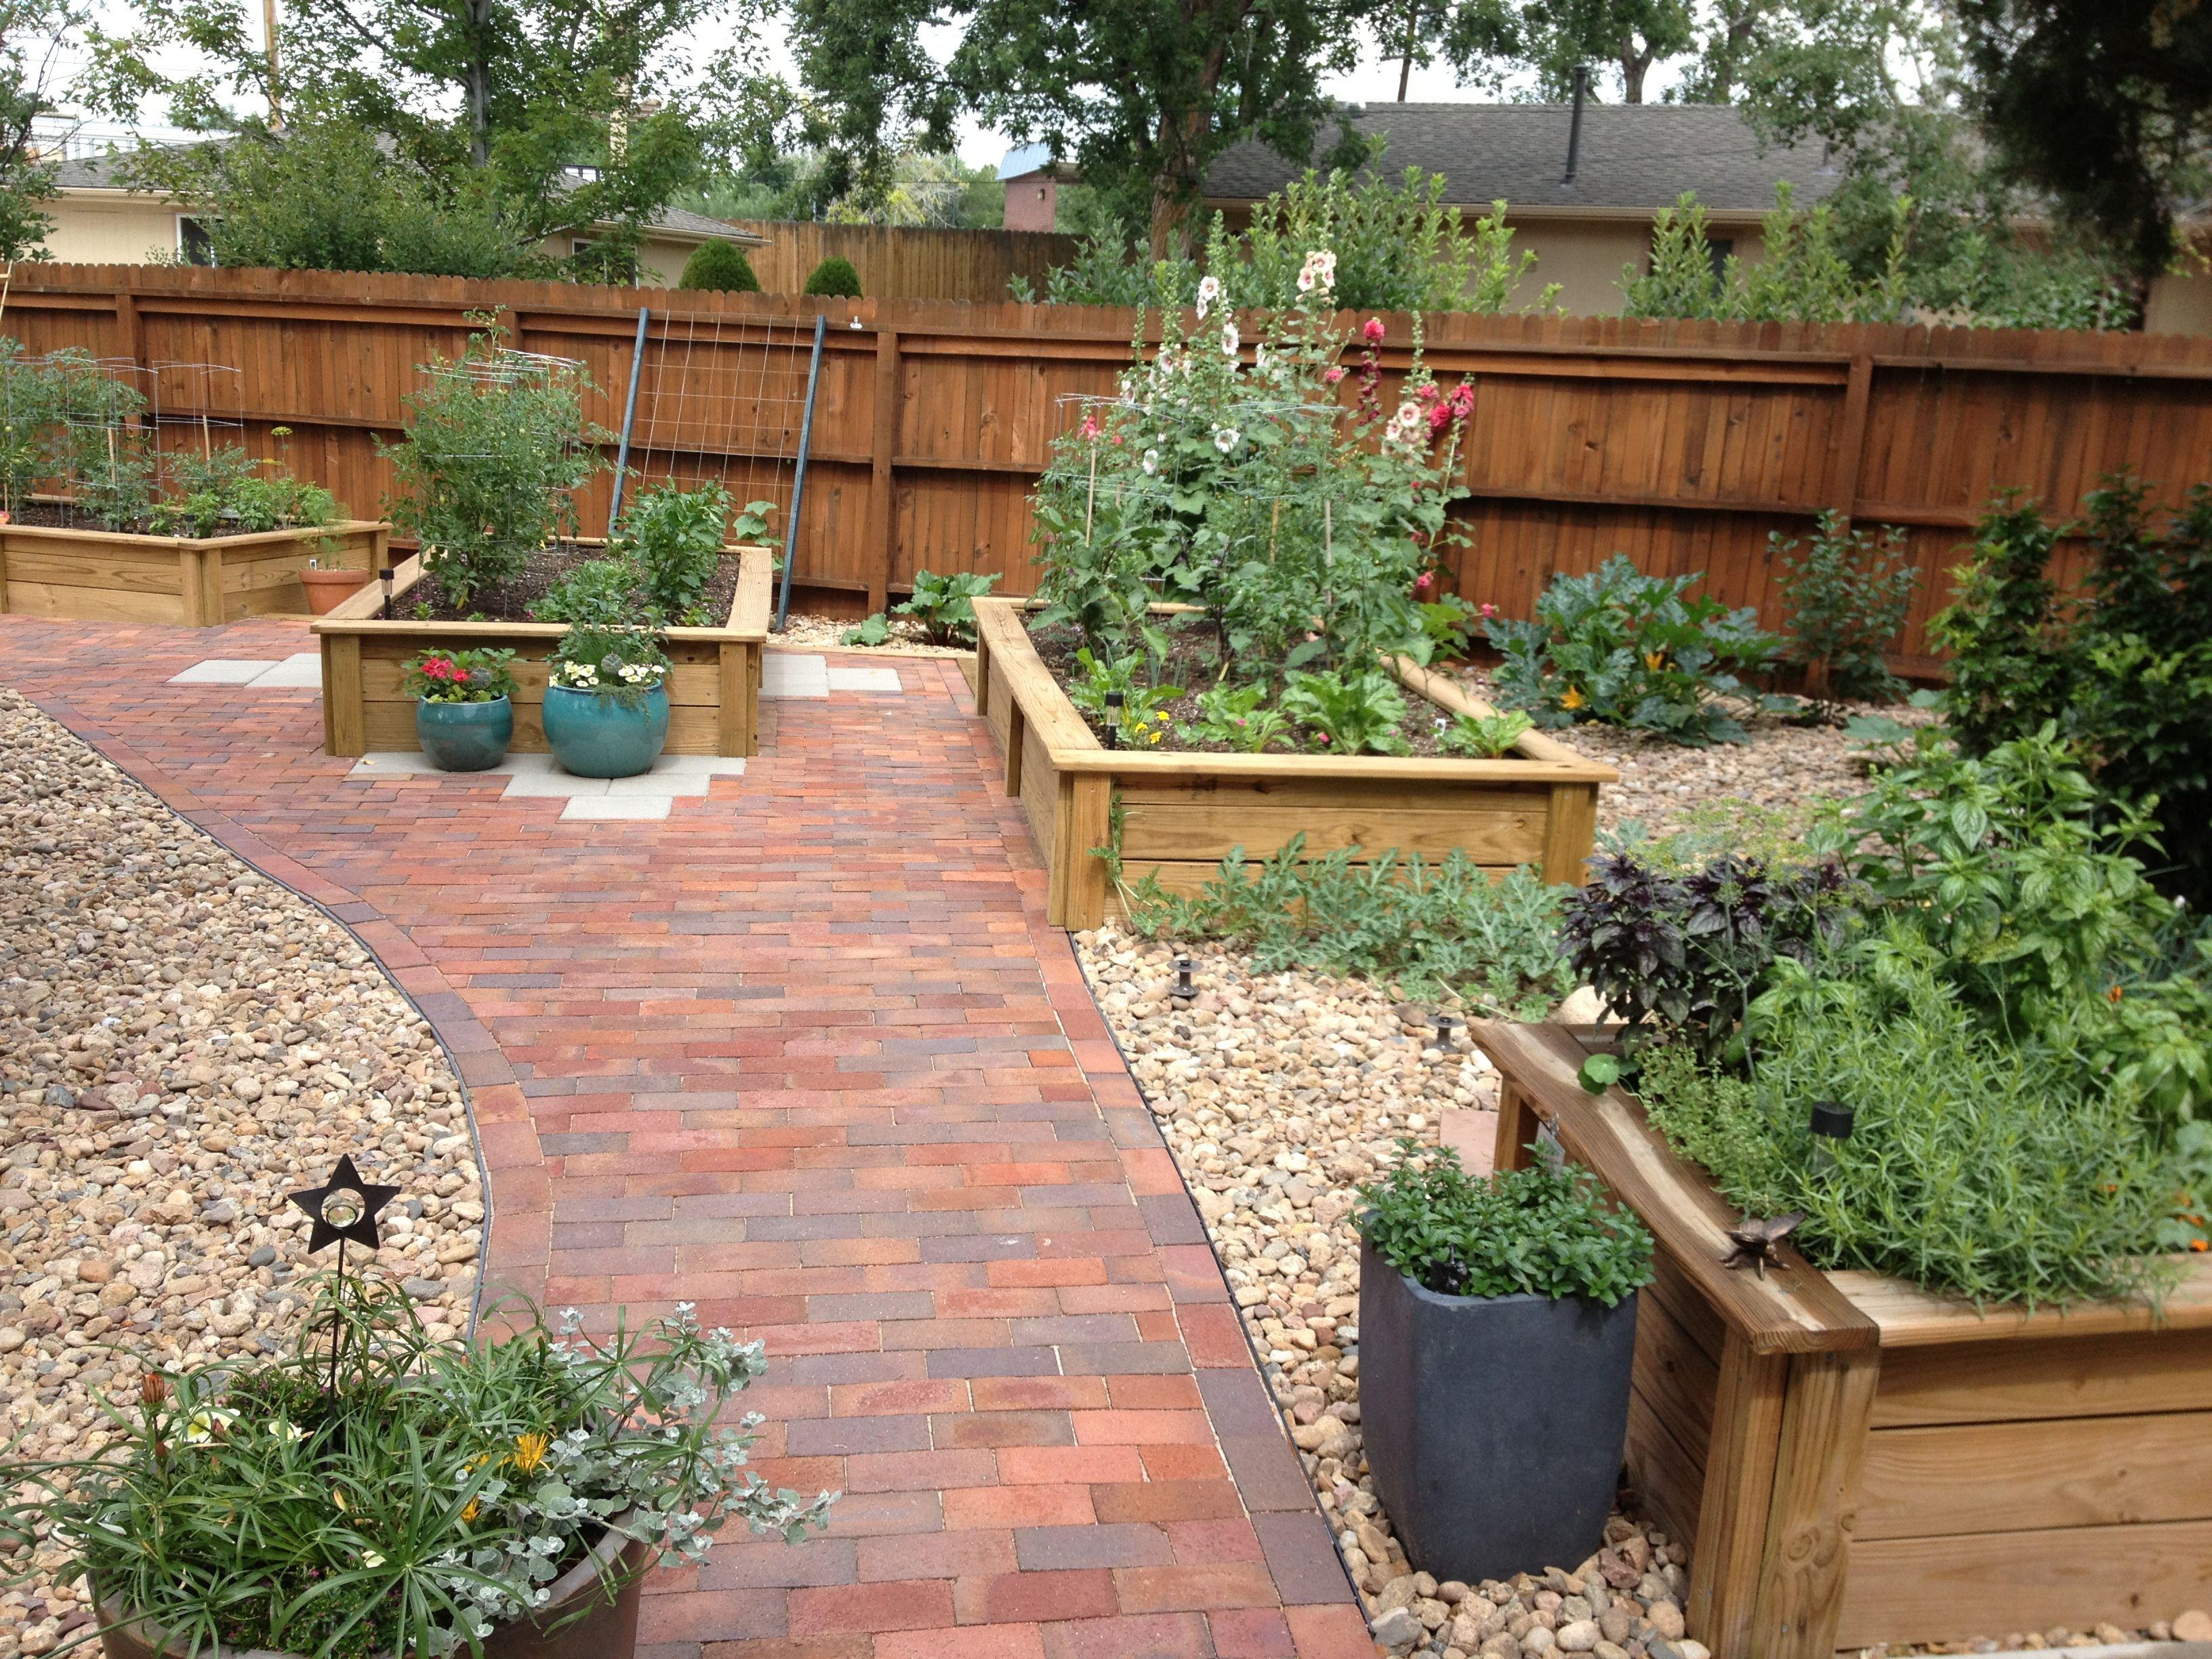 Raised beds with brick patiofar view Outdoor garden